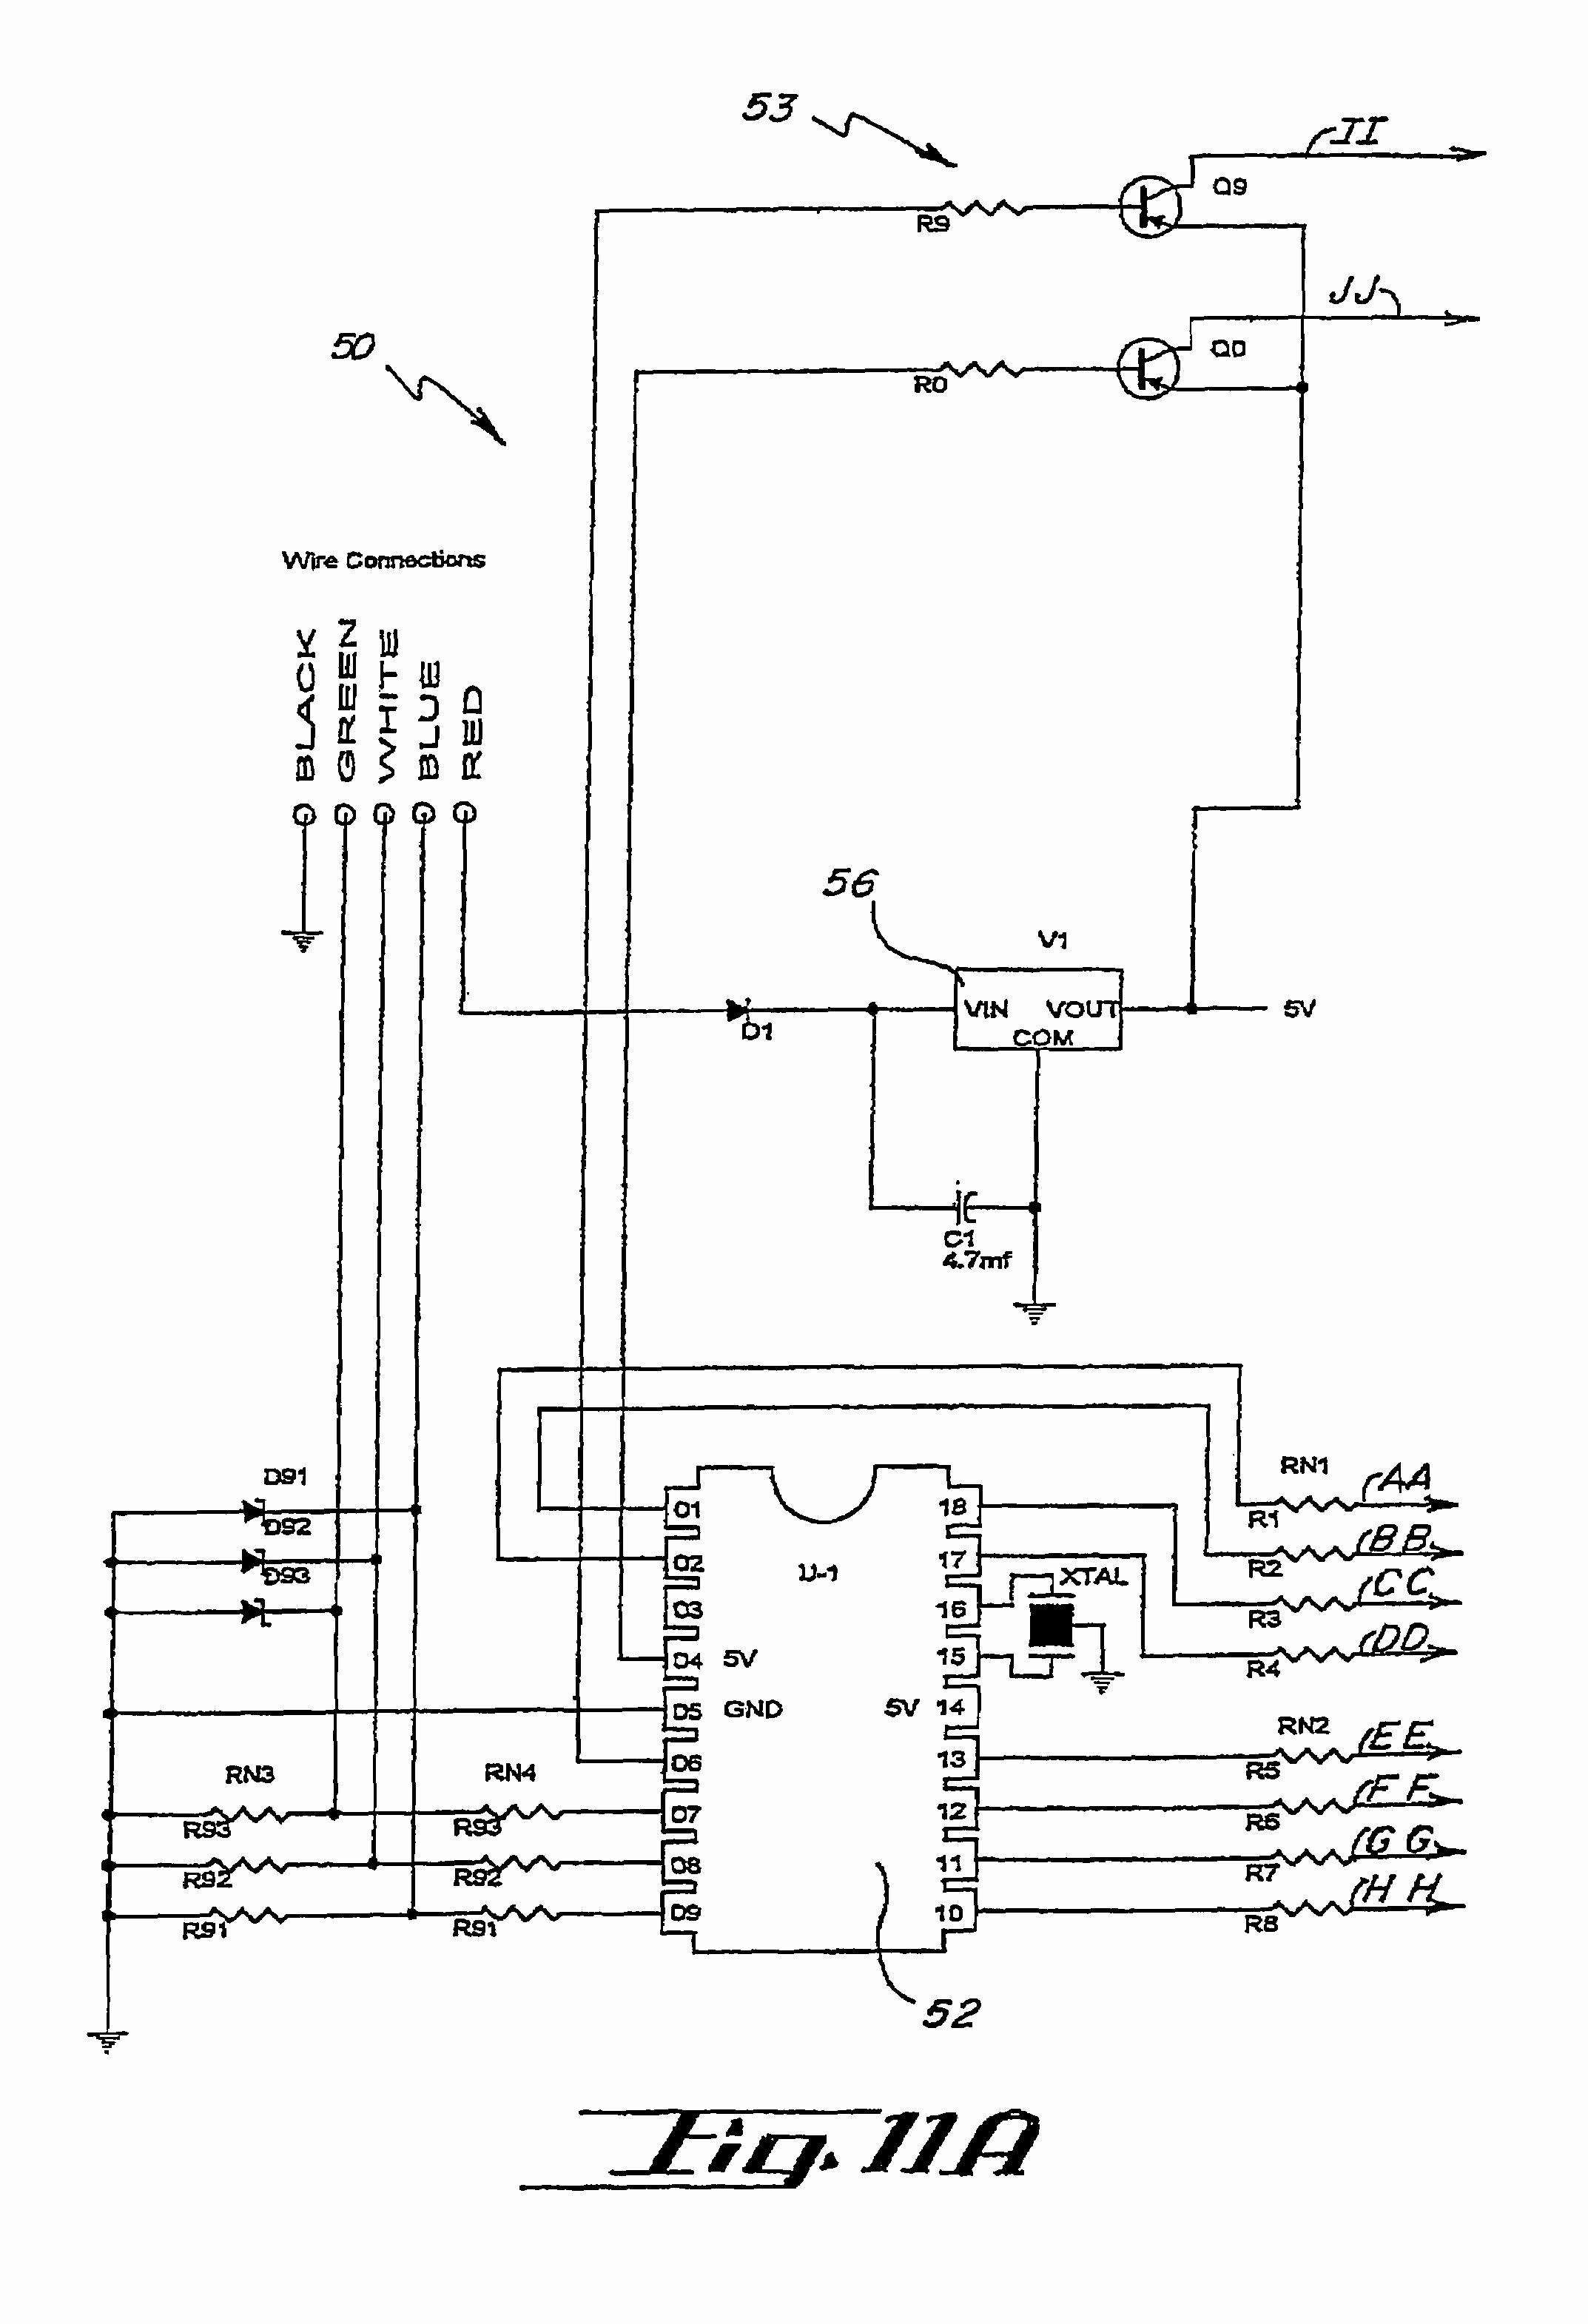 whelen light bar wiring diagram suburban water heater 295hfsa1 download